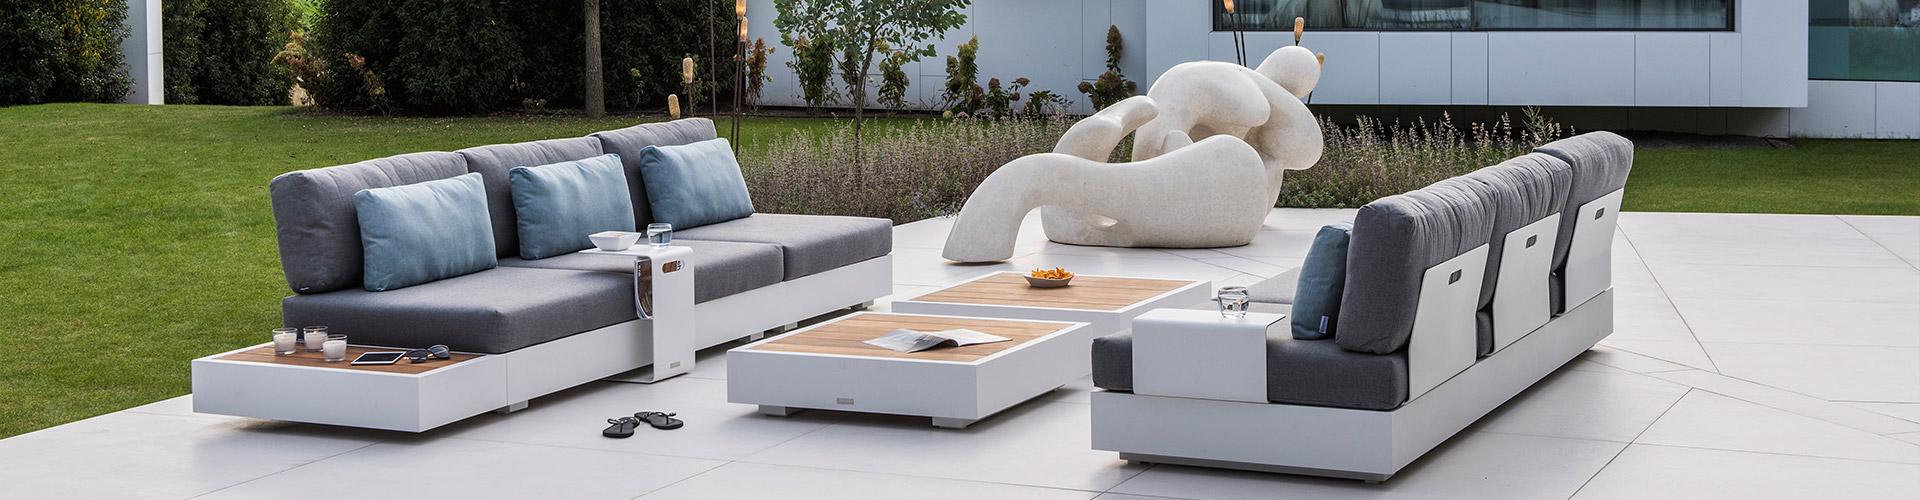 lounge-möbel design | möbelgarten